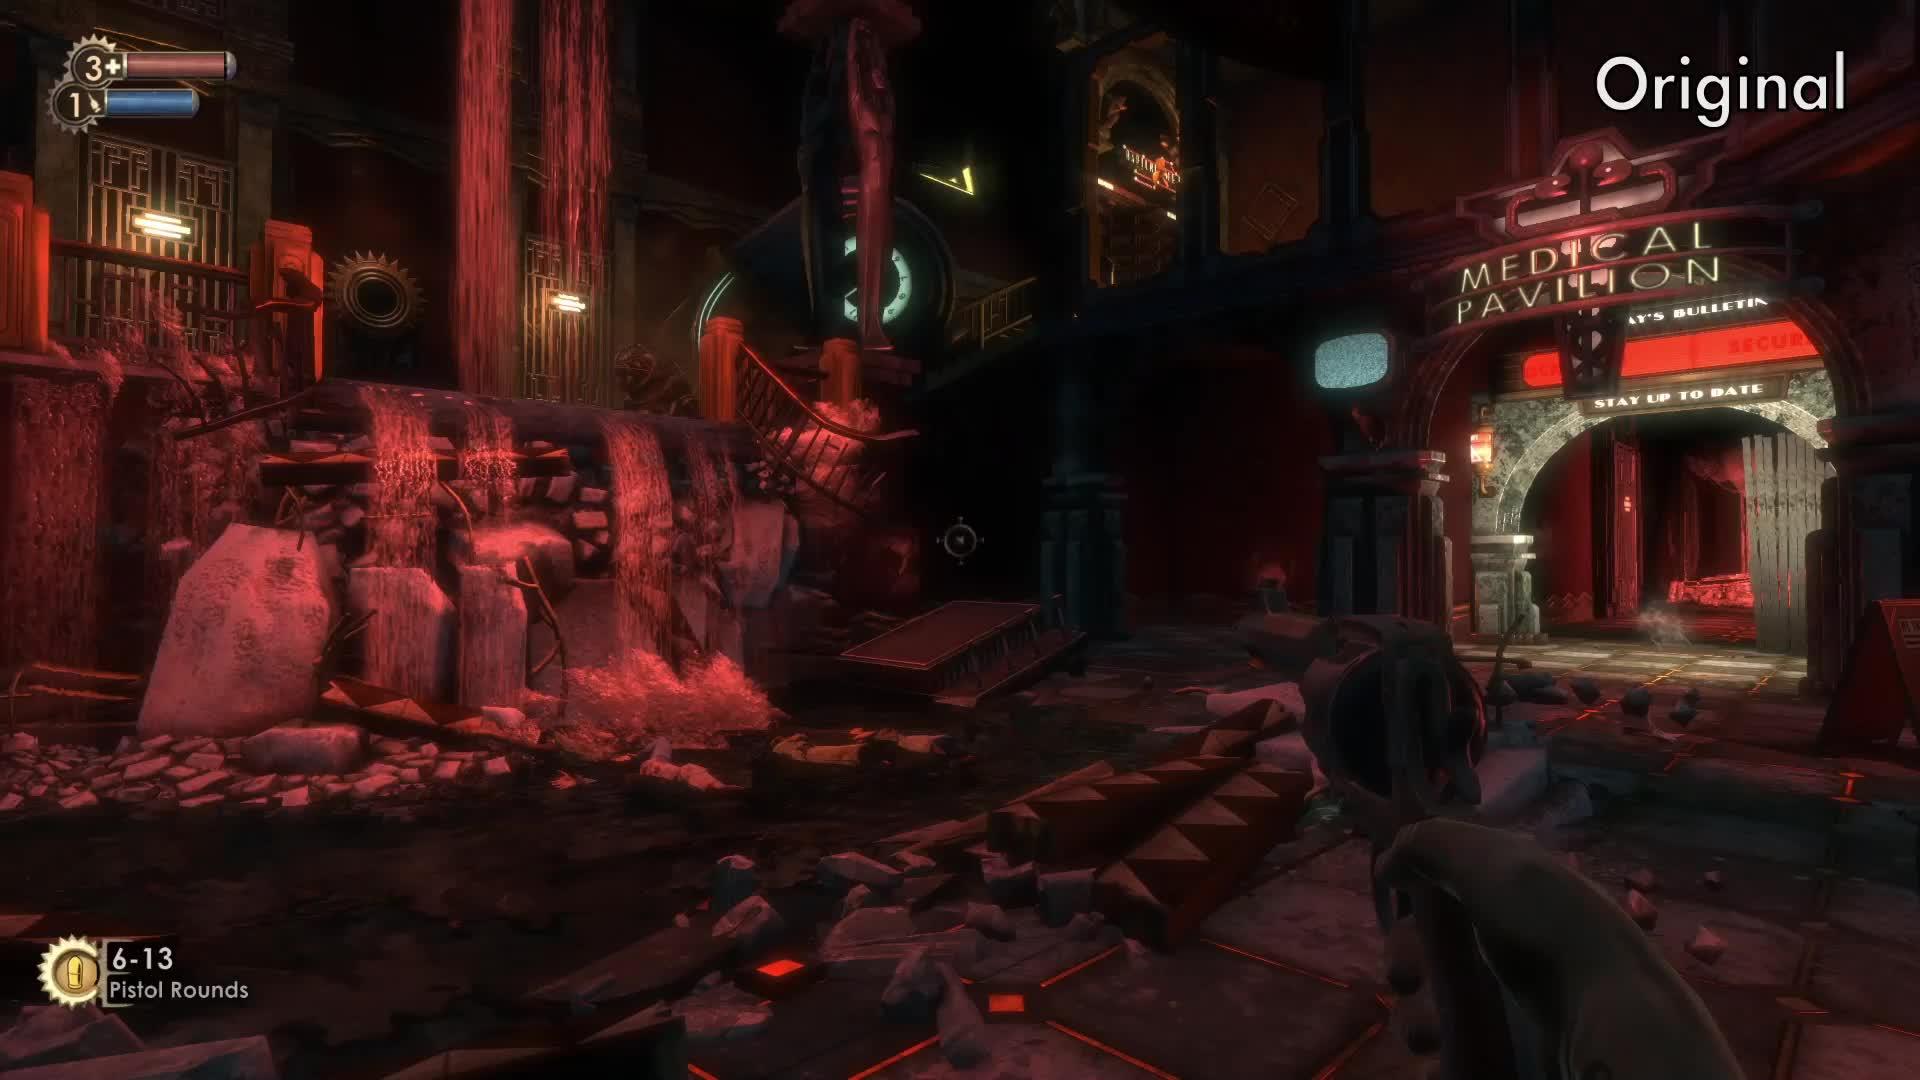 gamedeals, pcgaming, Bioshock Remastered Comparison #2 GIFs